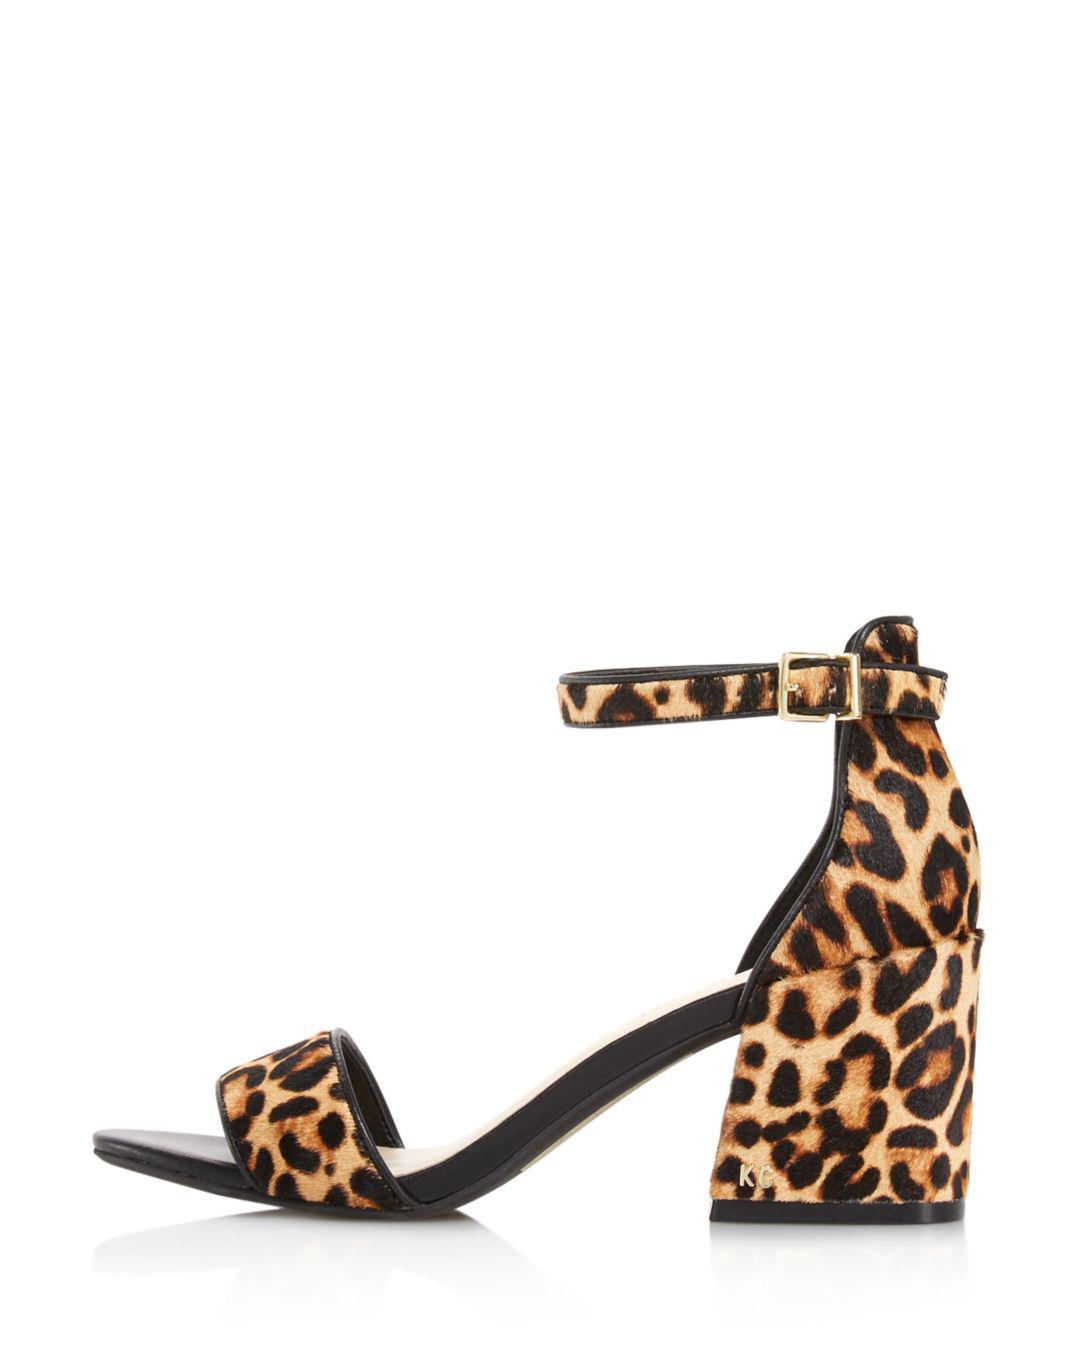 1dd19cc0d8f60 Kenneth Cole Women s Hannon Leopard Block Heel Sandals in Natural - Lyst